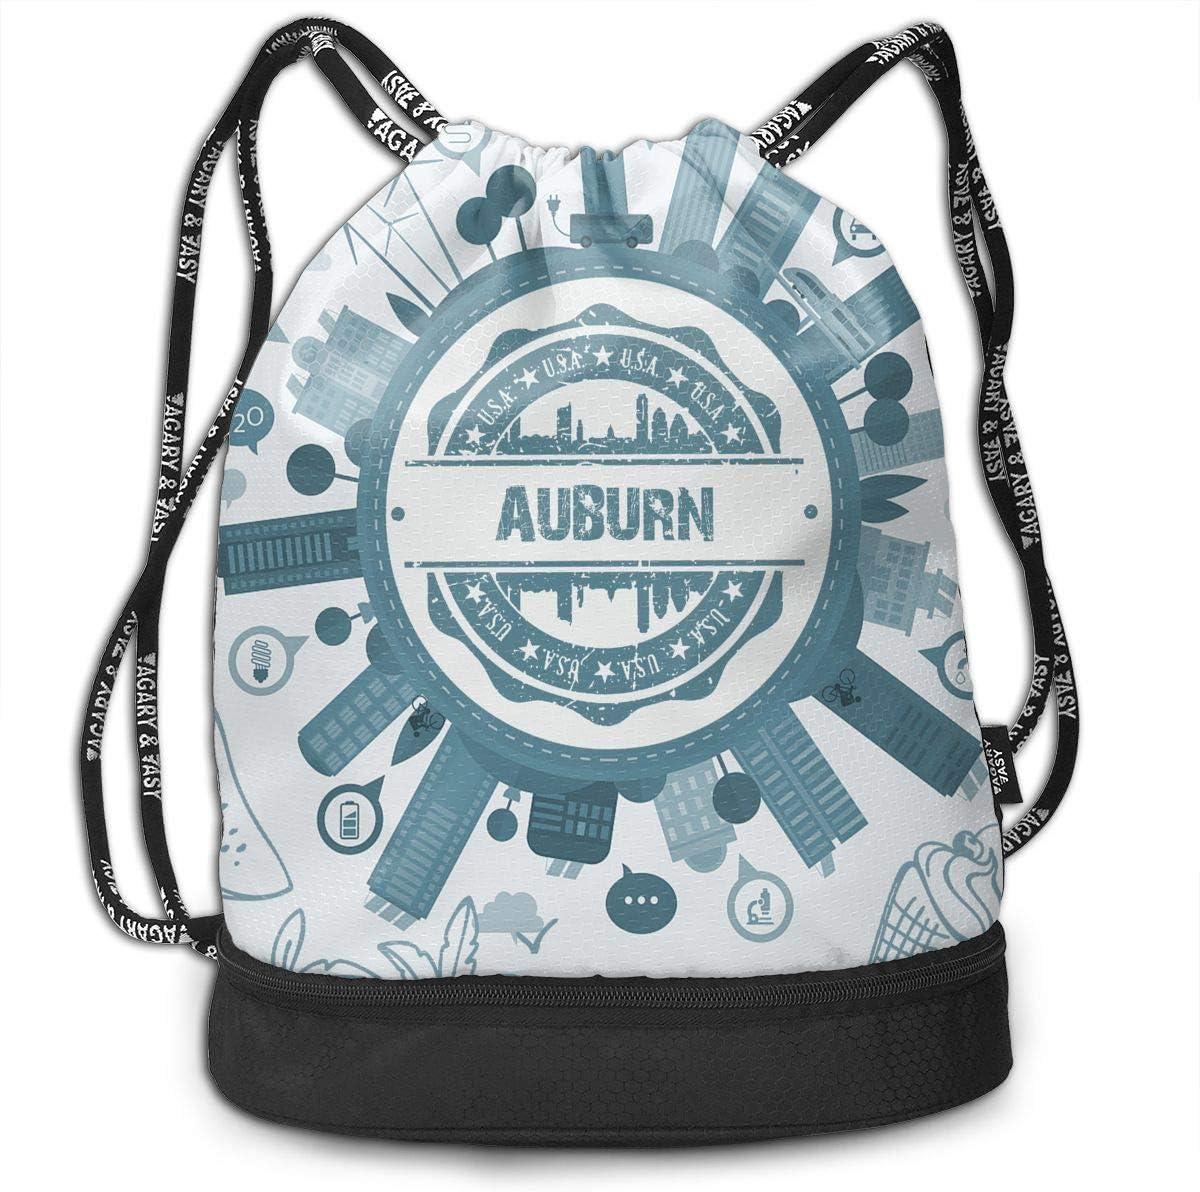 Travel Bag Pocket Daypack X-JUSEN Print Auburn Multi-Function Drawstring Bundle Backpack Burst Sackpack Tote Cinch Sack